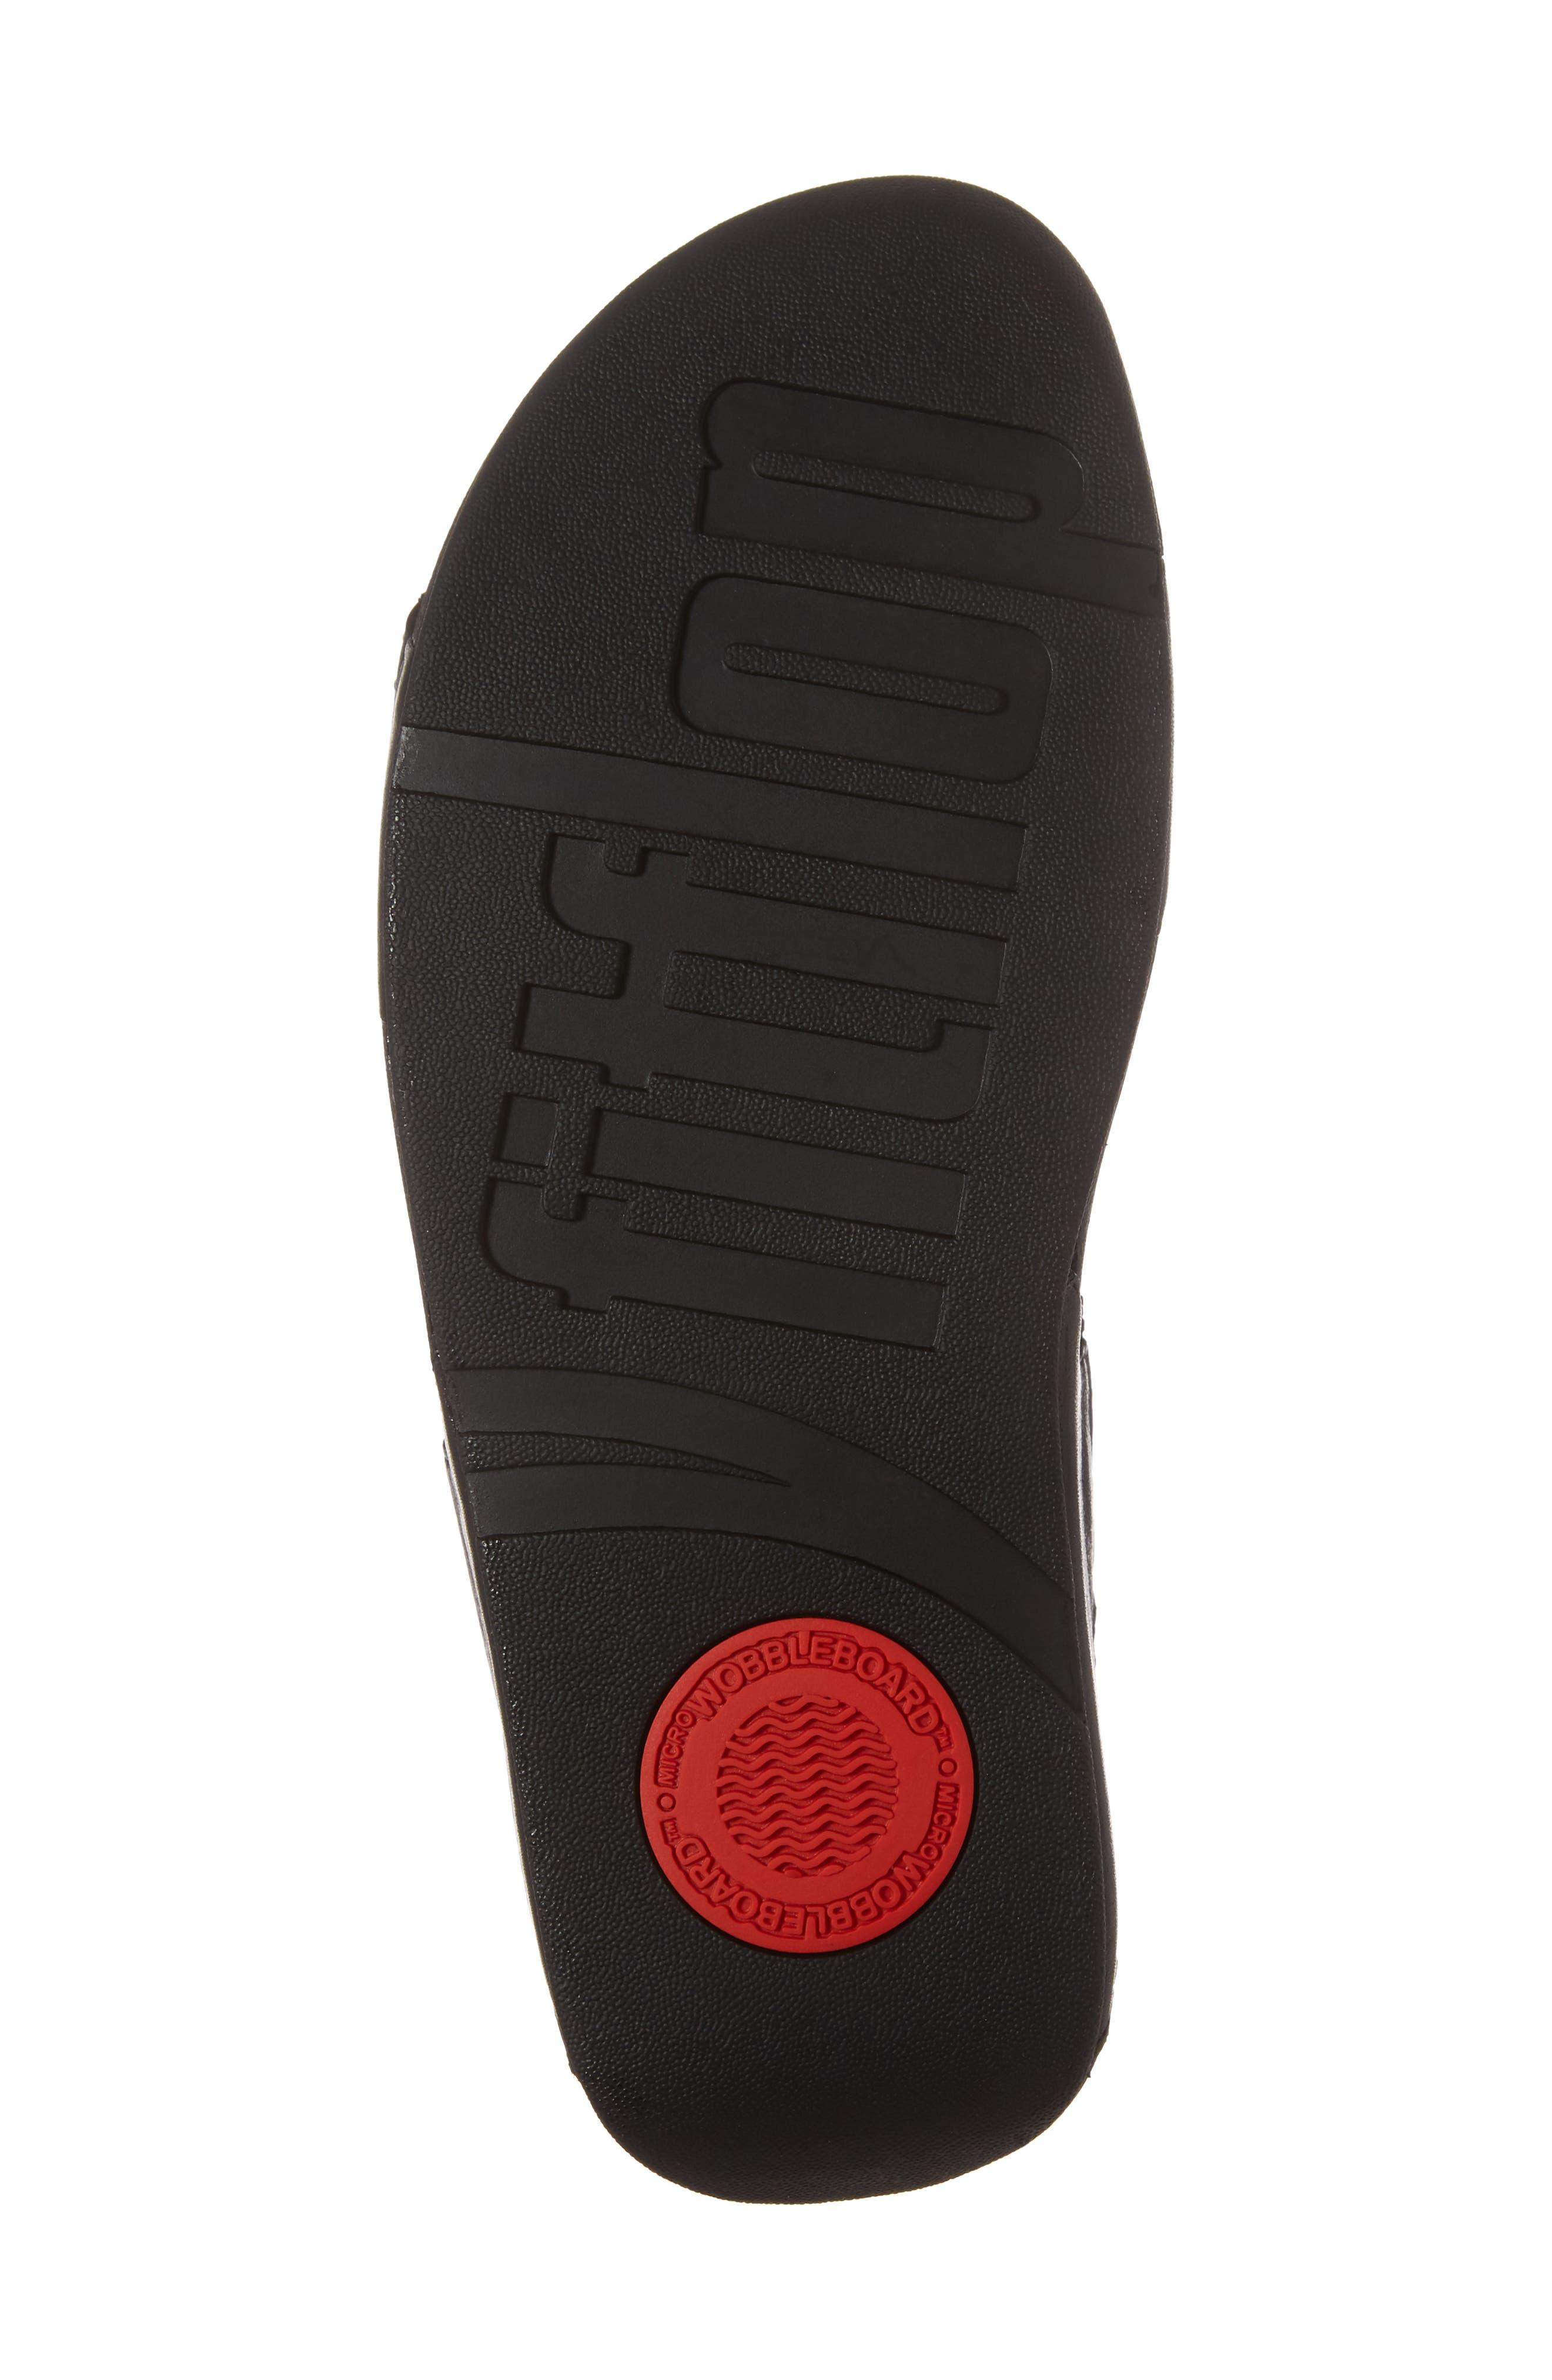 Bumble Wedge Slide Sandal,                             Alternate thumbnail 6, color,                             Black Leather